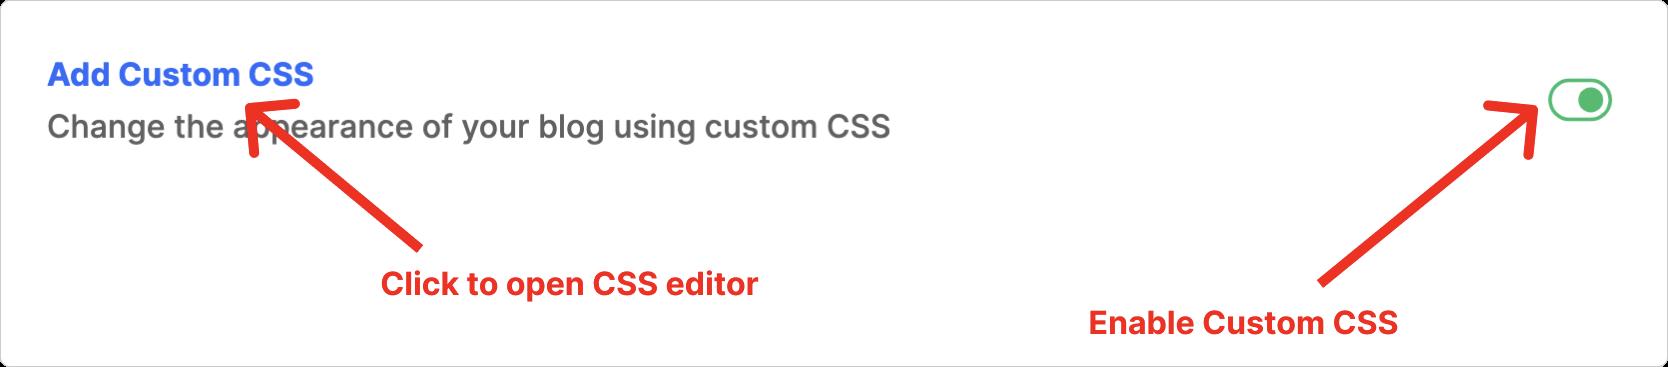 Hashnode's Custom CSS